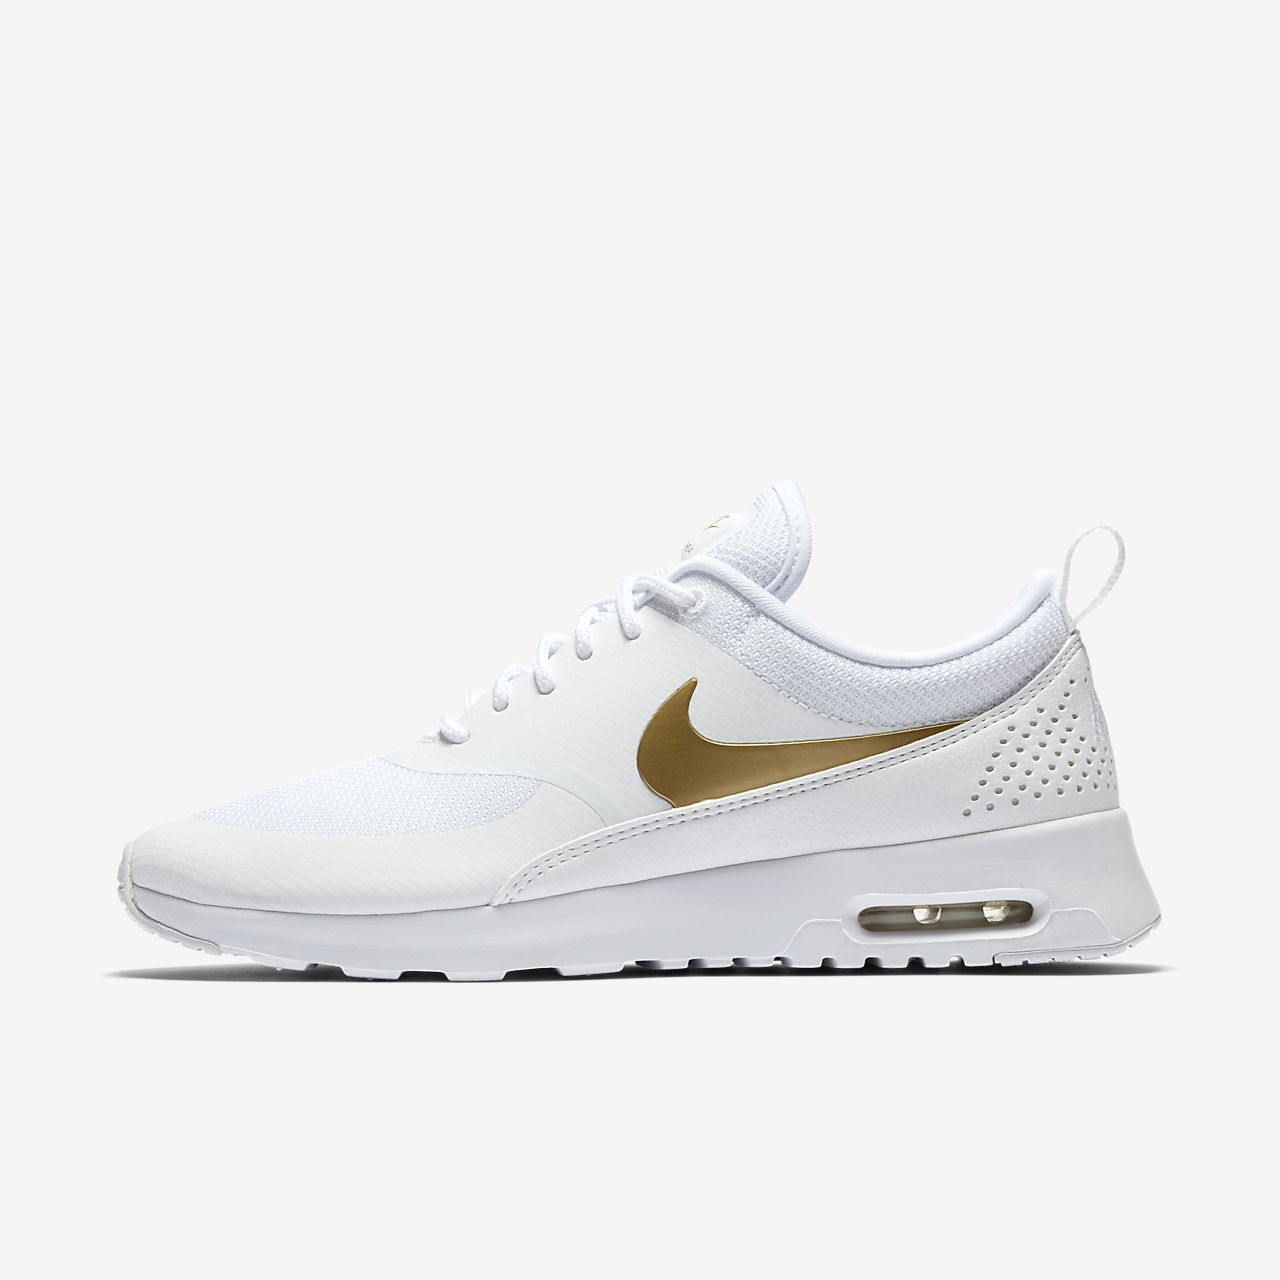 sports shoes a14b2 7713e new zealand nike air max thea kvinders guld b98e8 e49f9